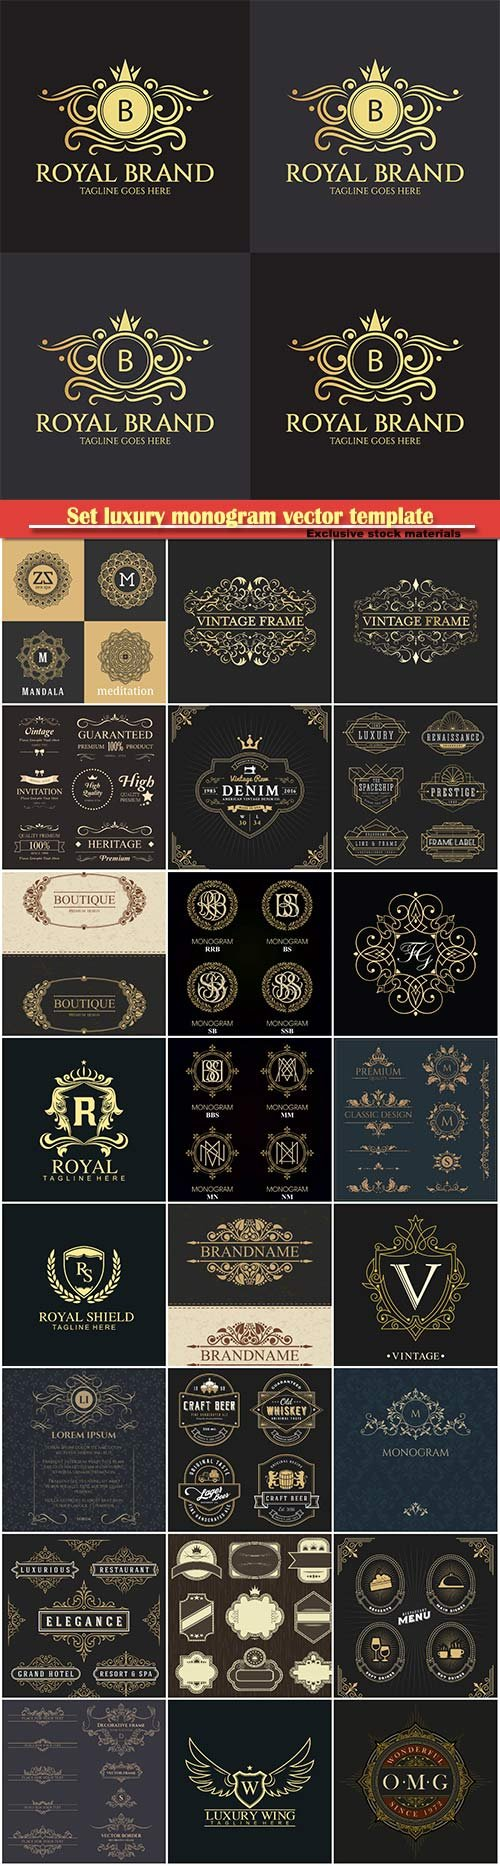 Set luxury monogram vector template, logos, badges, symbols # 8